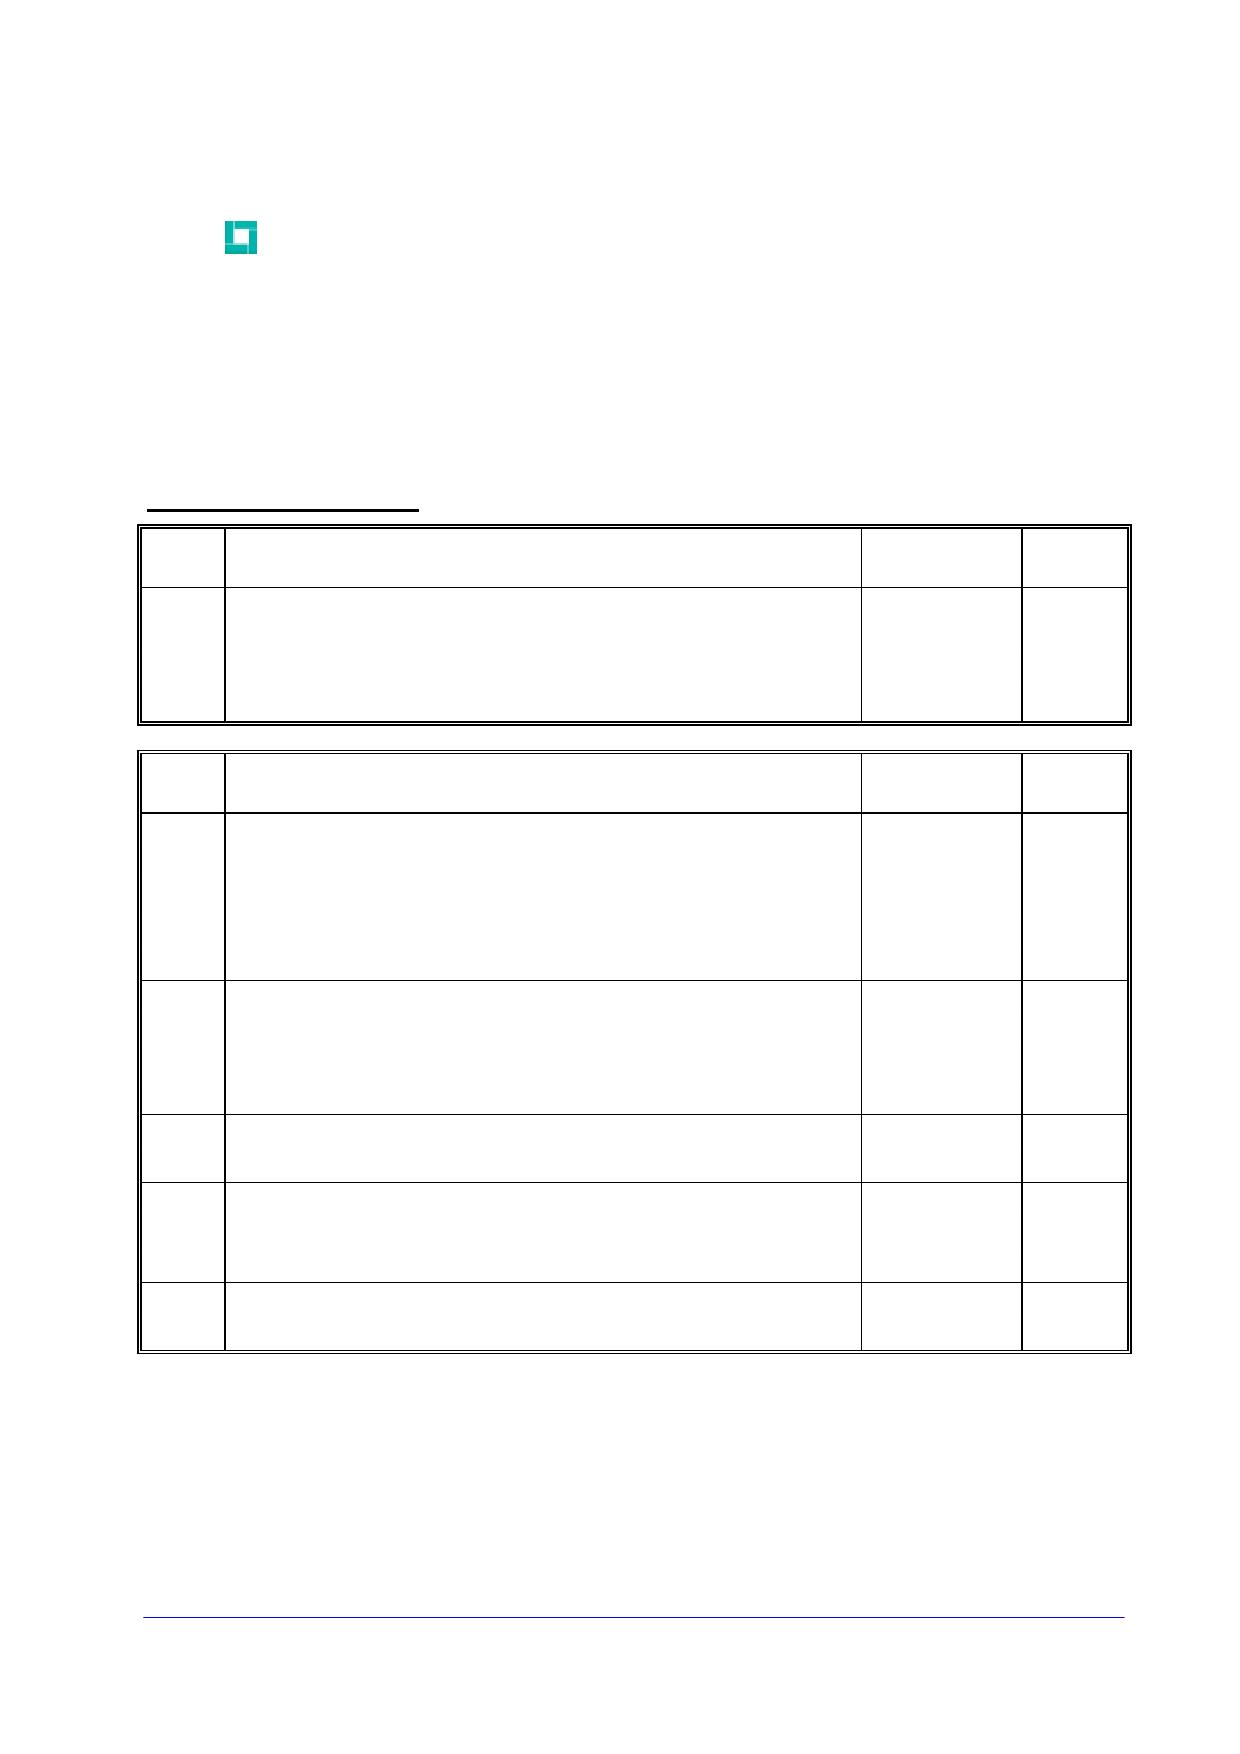 K0890NC360 datasheet